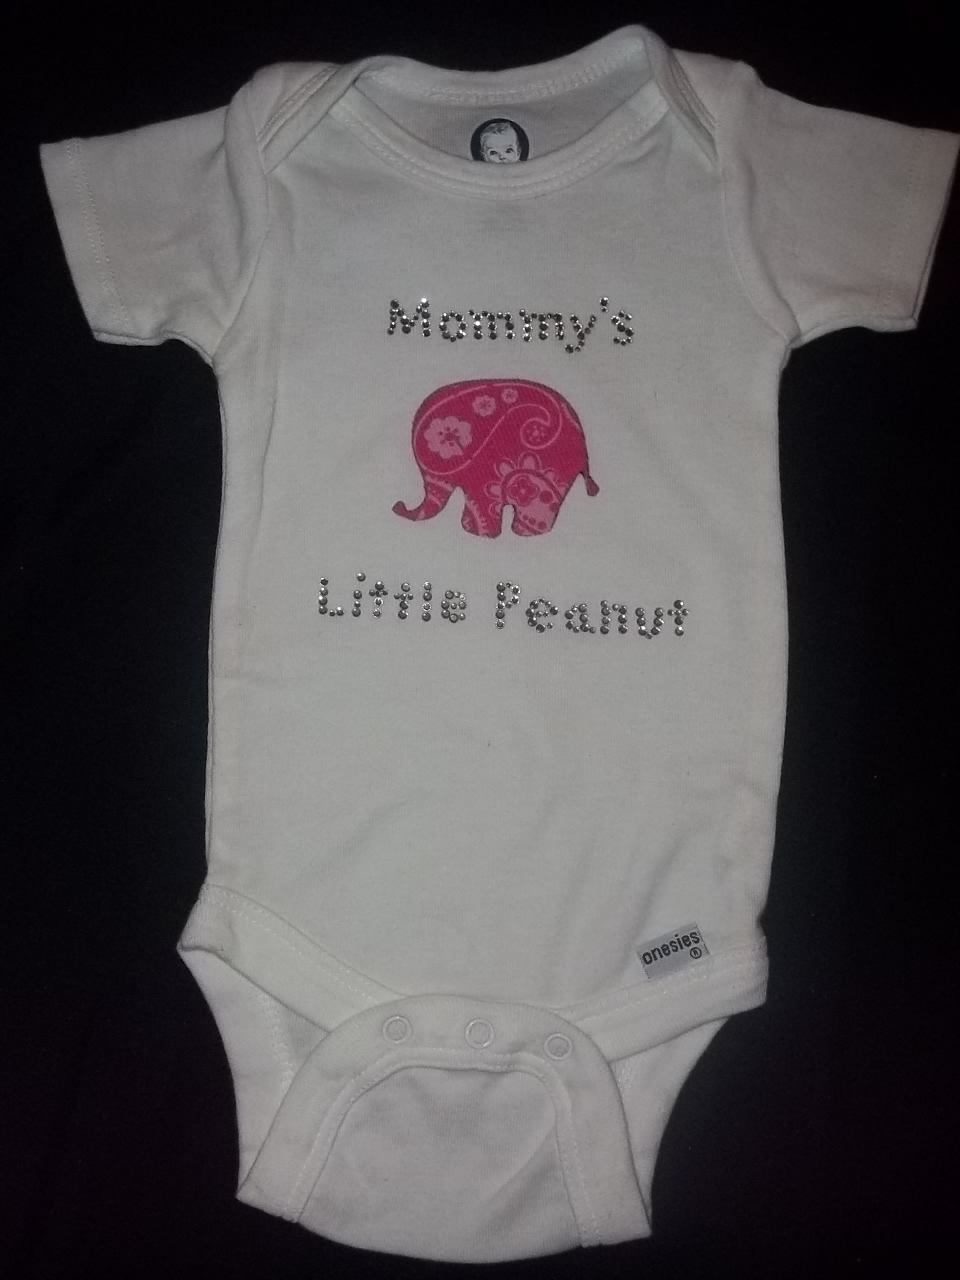 e43423bf48ac Pink elephant onesie (mommy s little peanut) on Storenvy